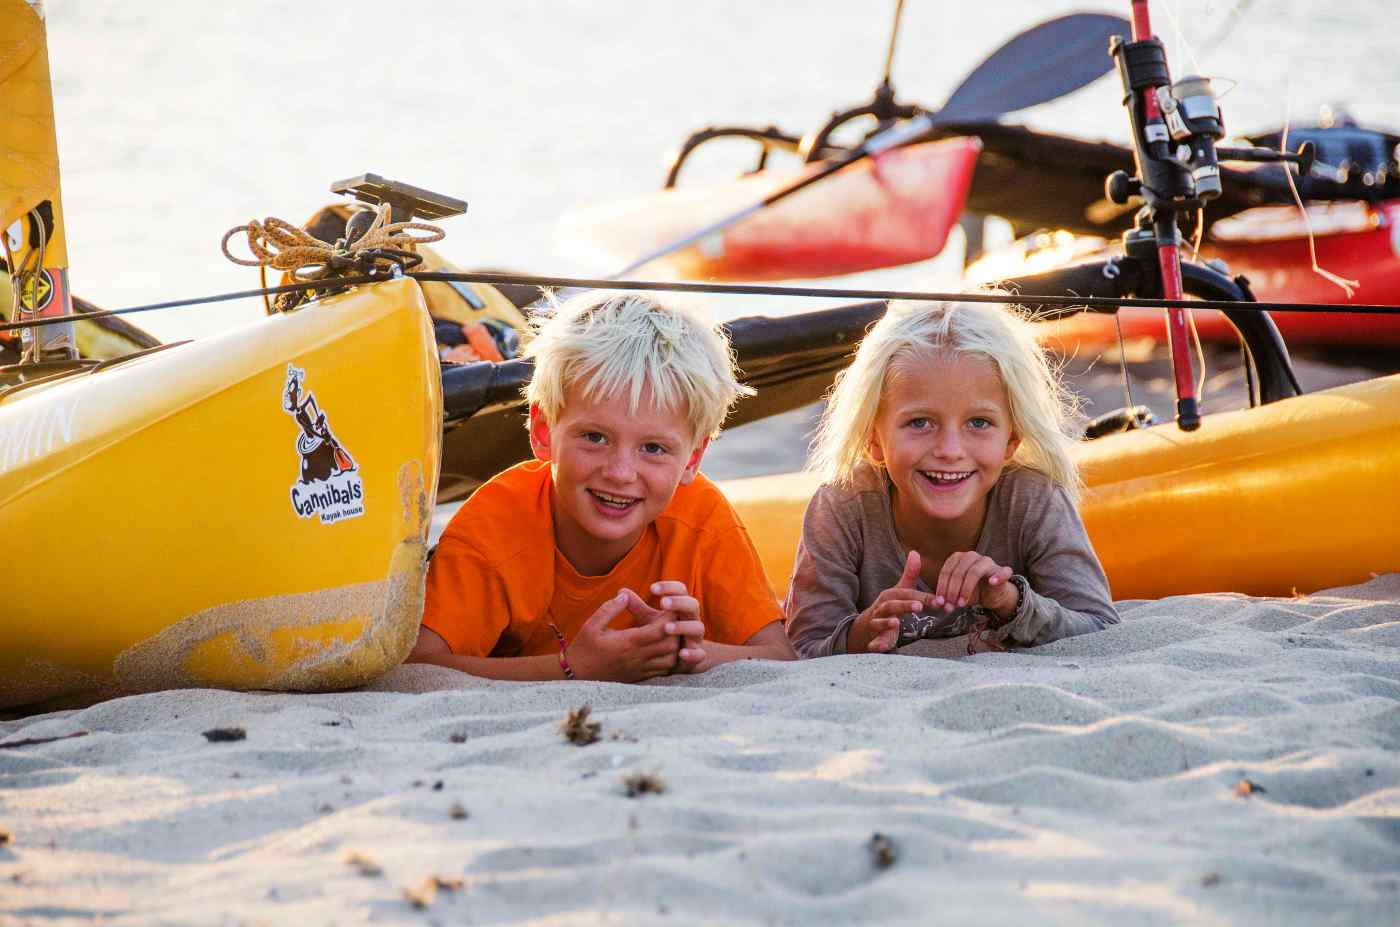 Playing around the kayaks